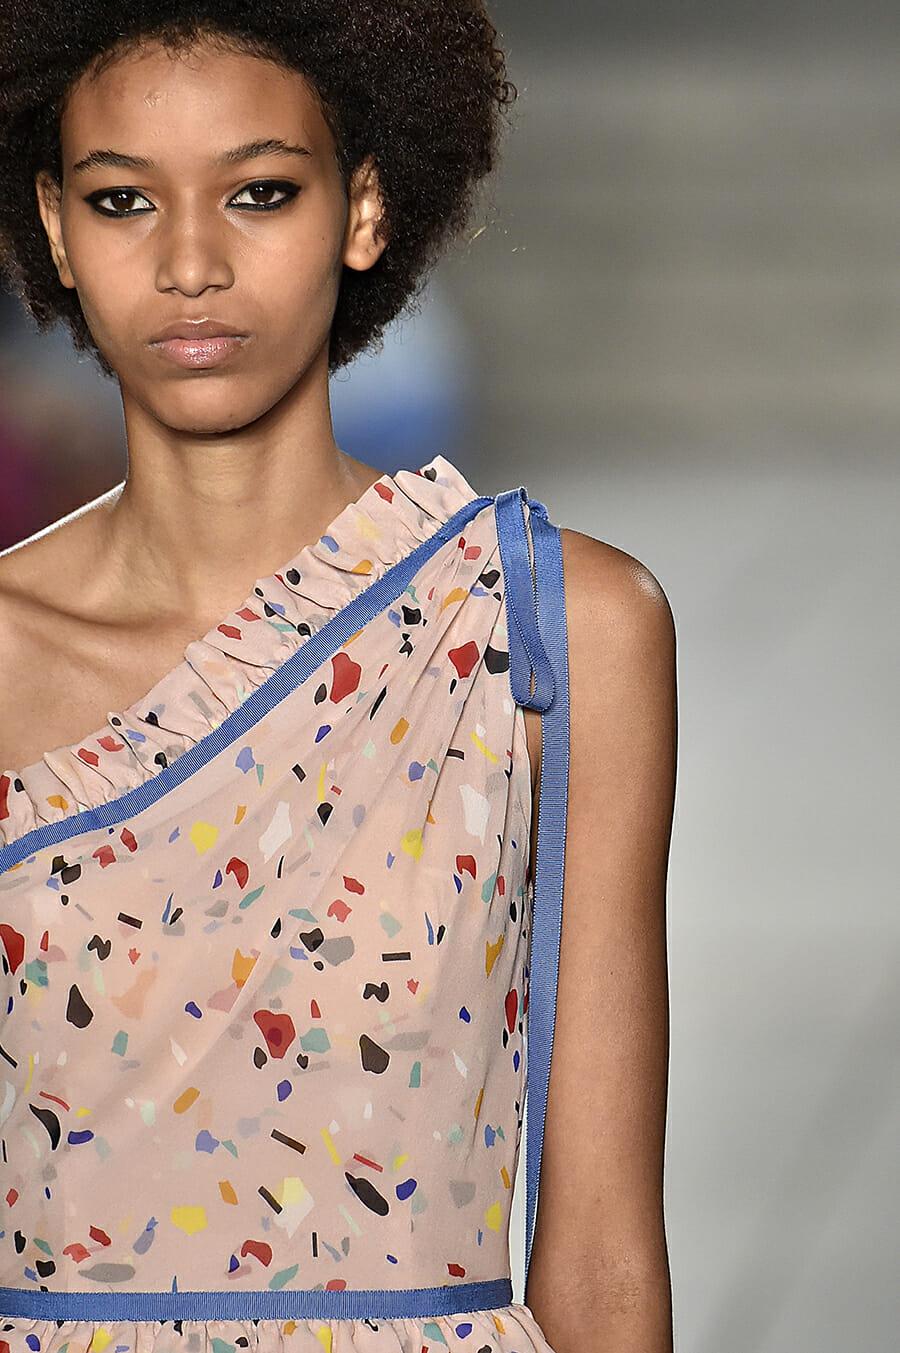 Carolina-Herrera-New-York-Fashion-Week-Spring-Summer-2018-NY-September-2017-look18-detail1